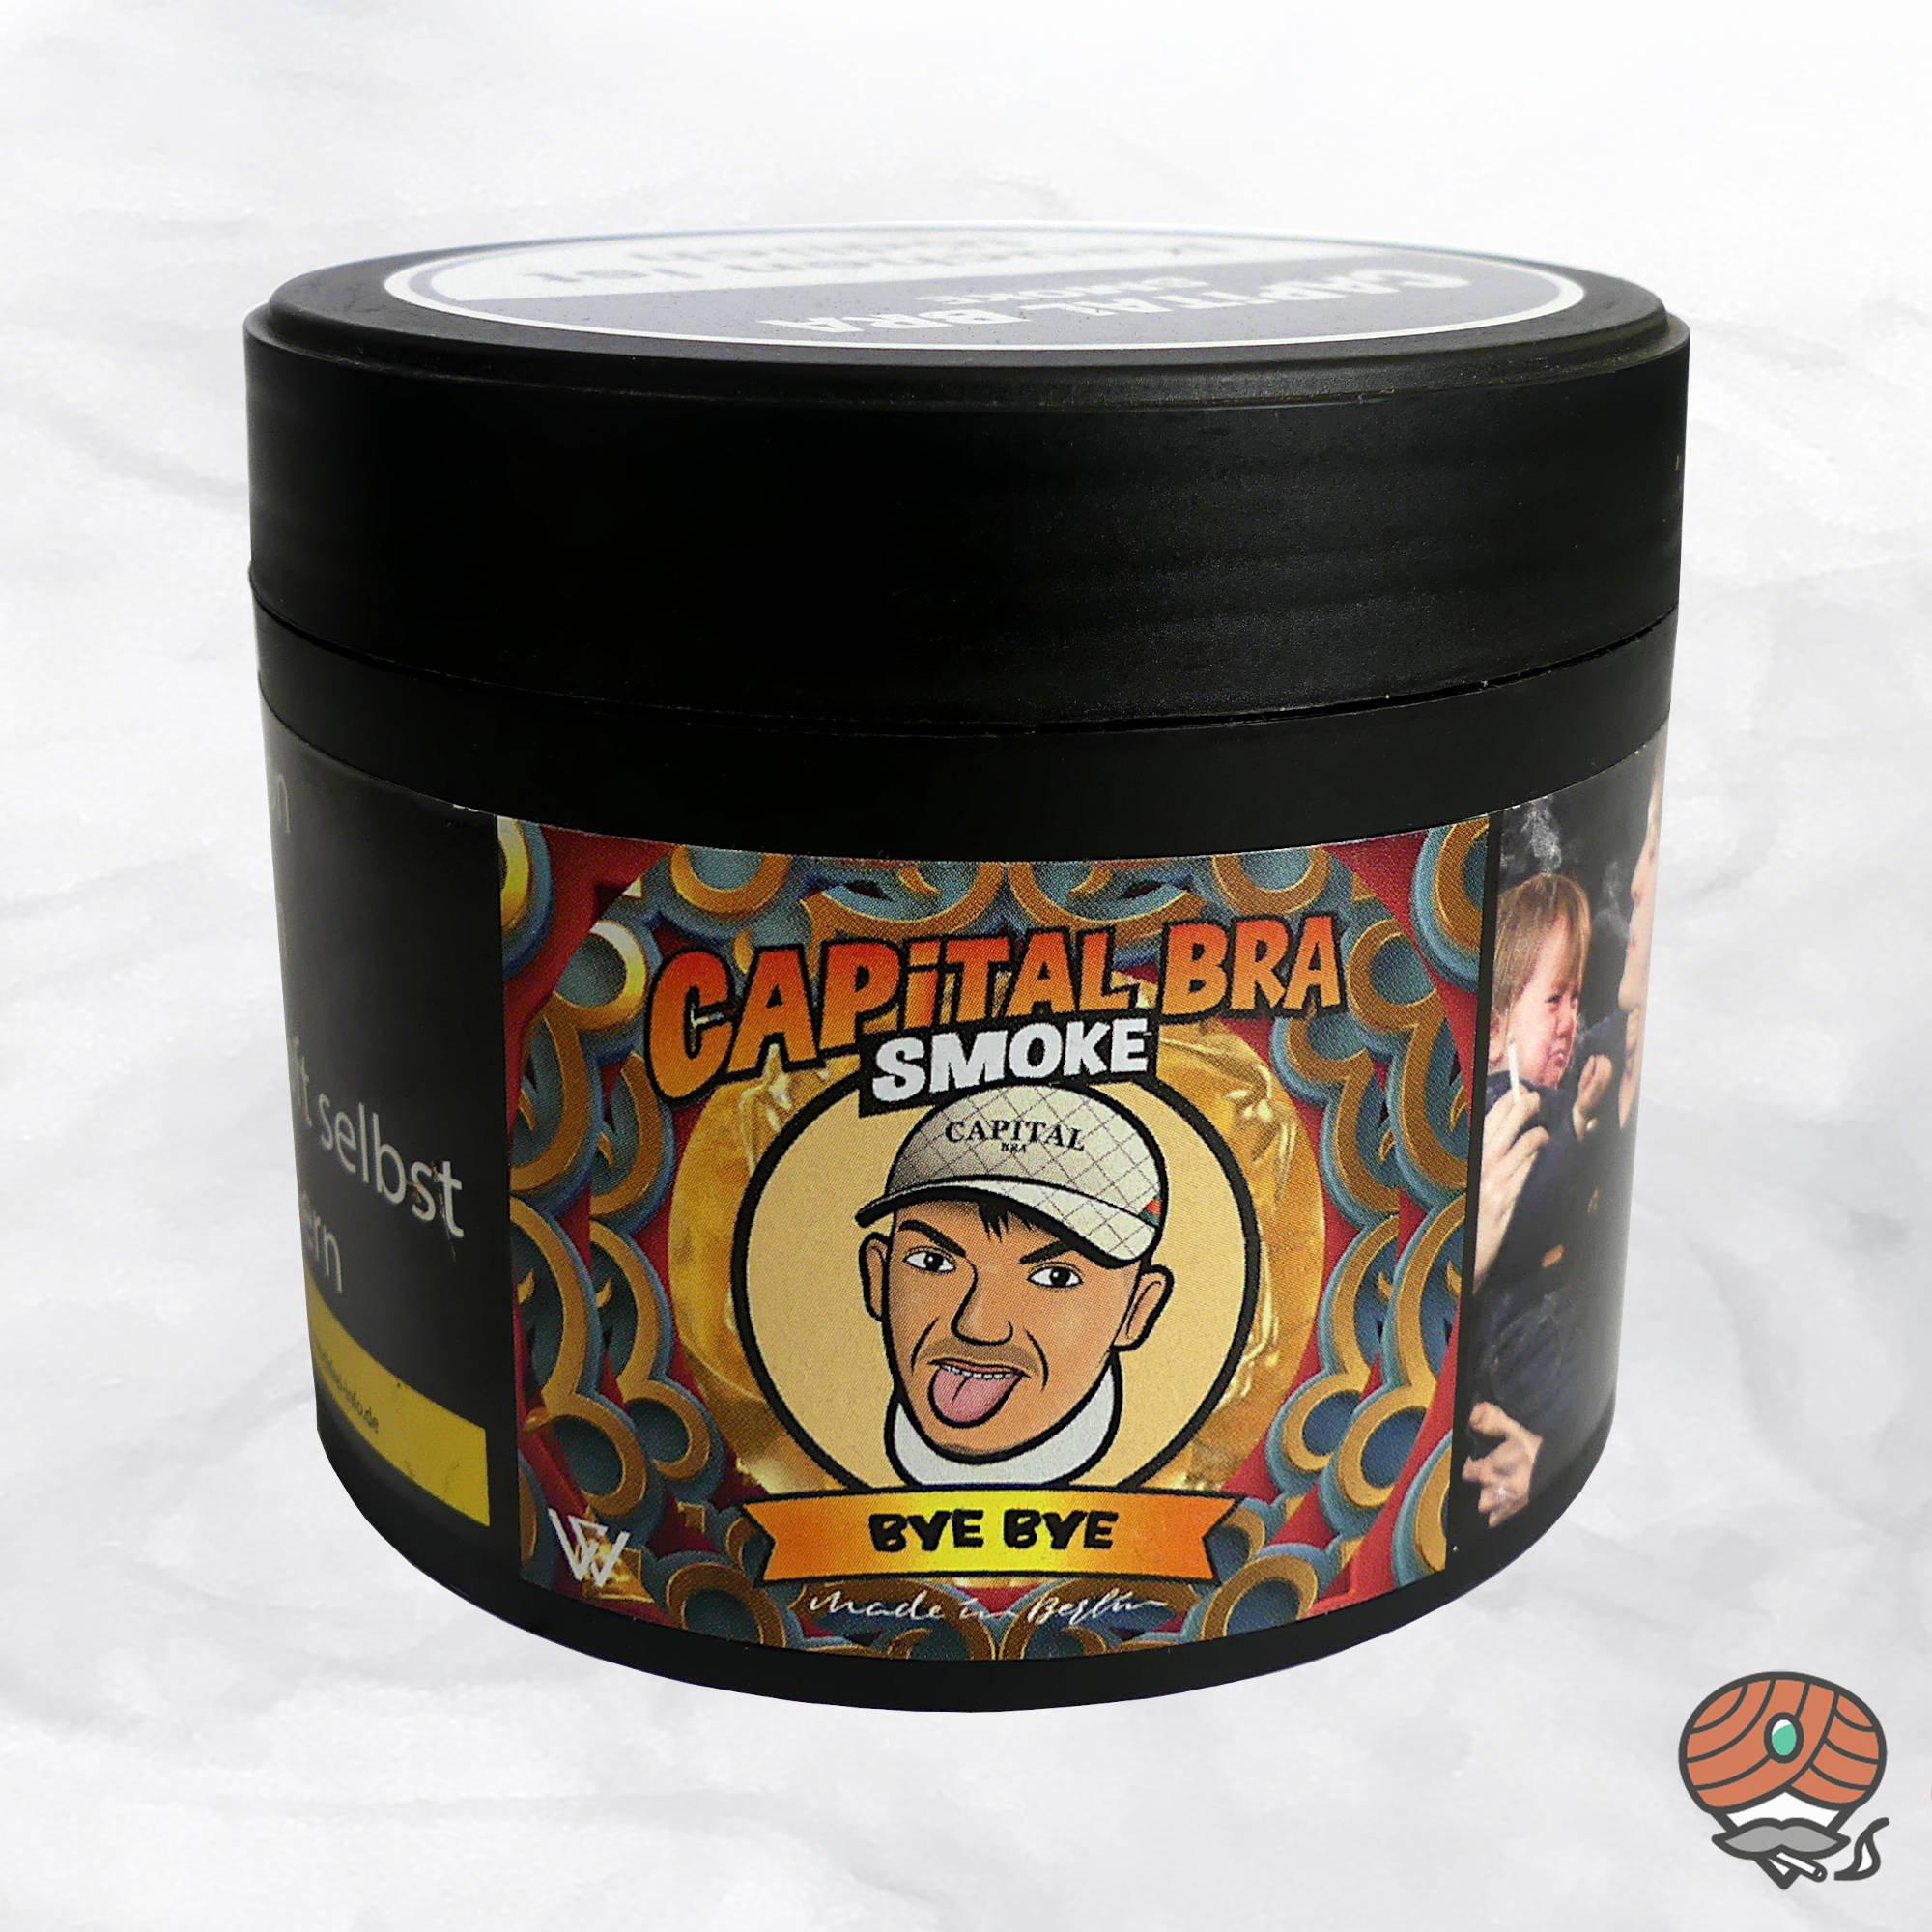 Capital Bra Smoke Shisha Tabak - Bye Bye 200g